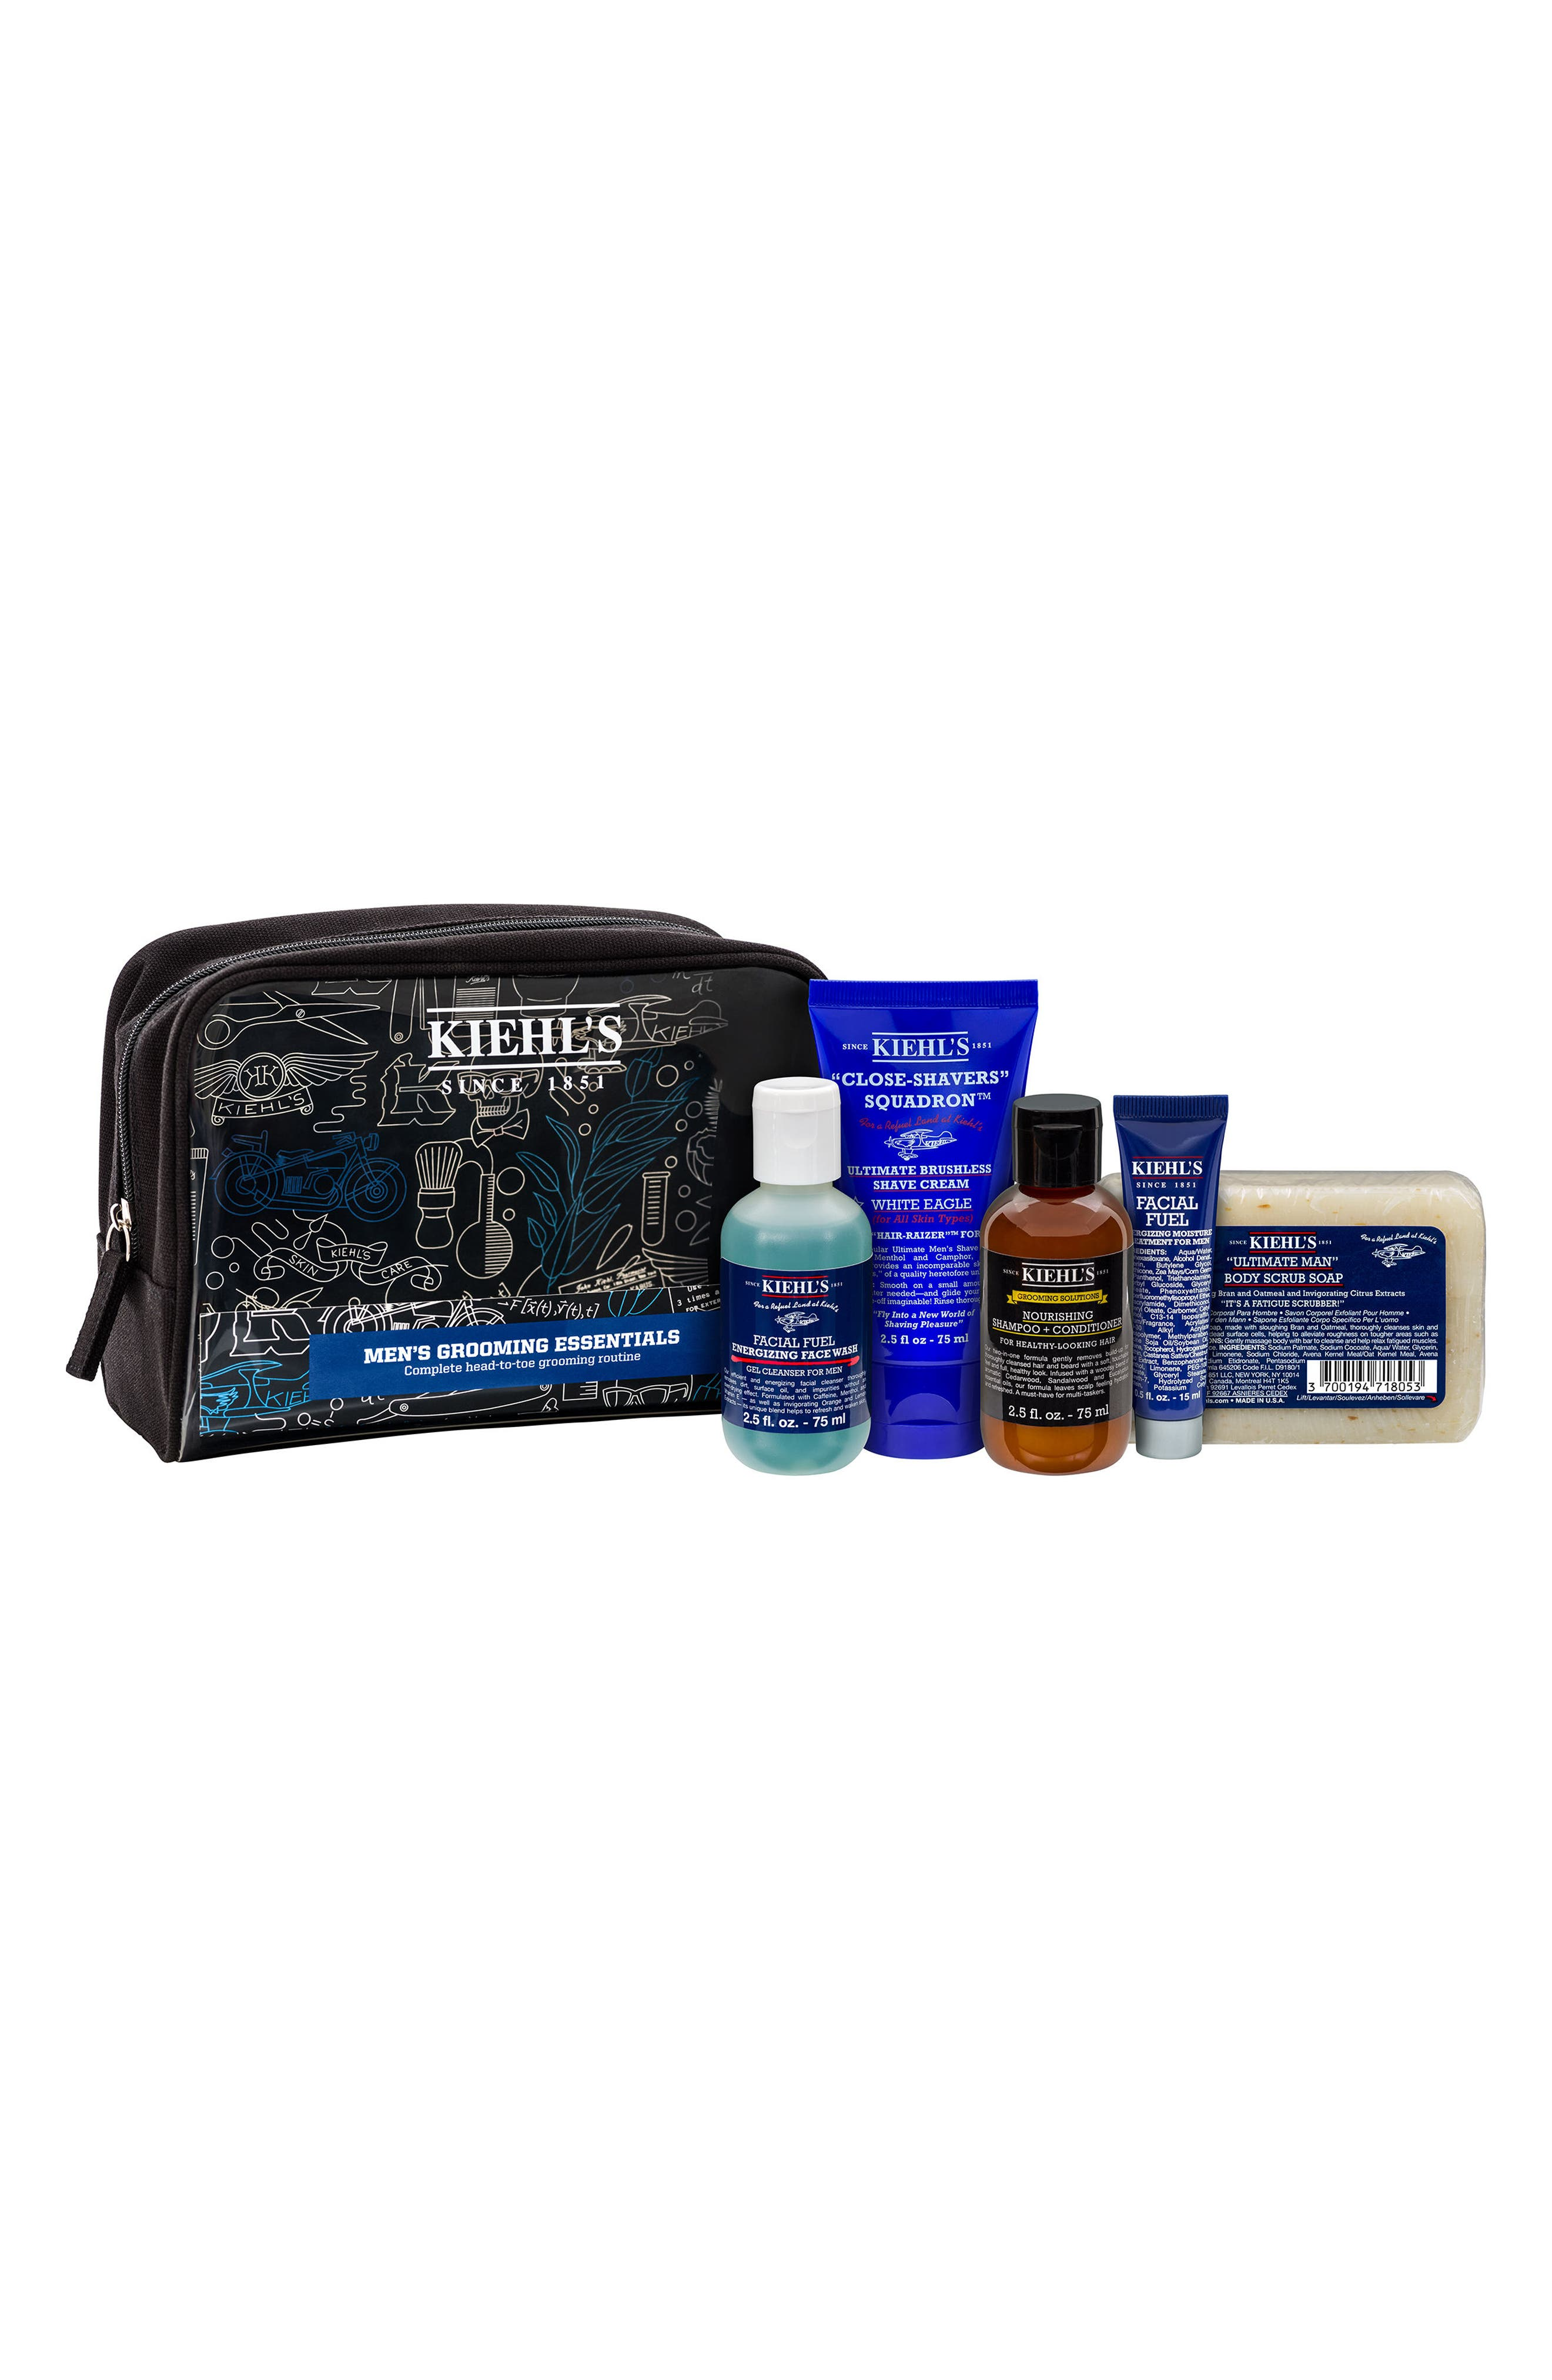 Men's Grooming Essentials Set,                             Main thumbnail 1, color,                             000